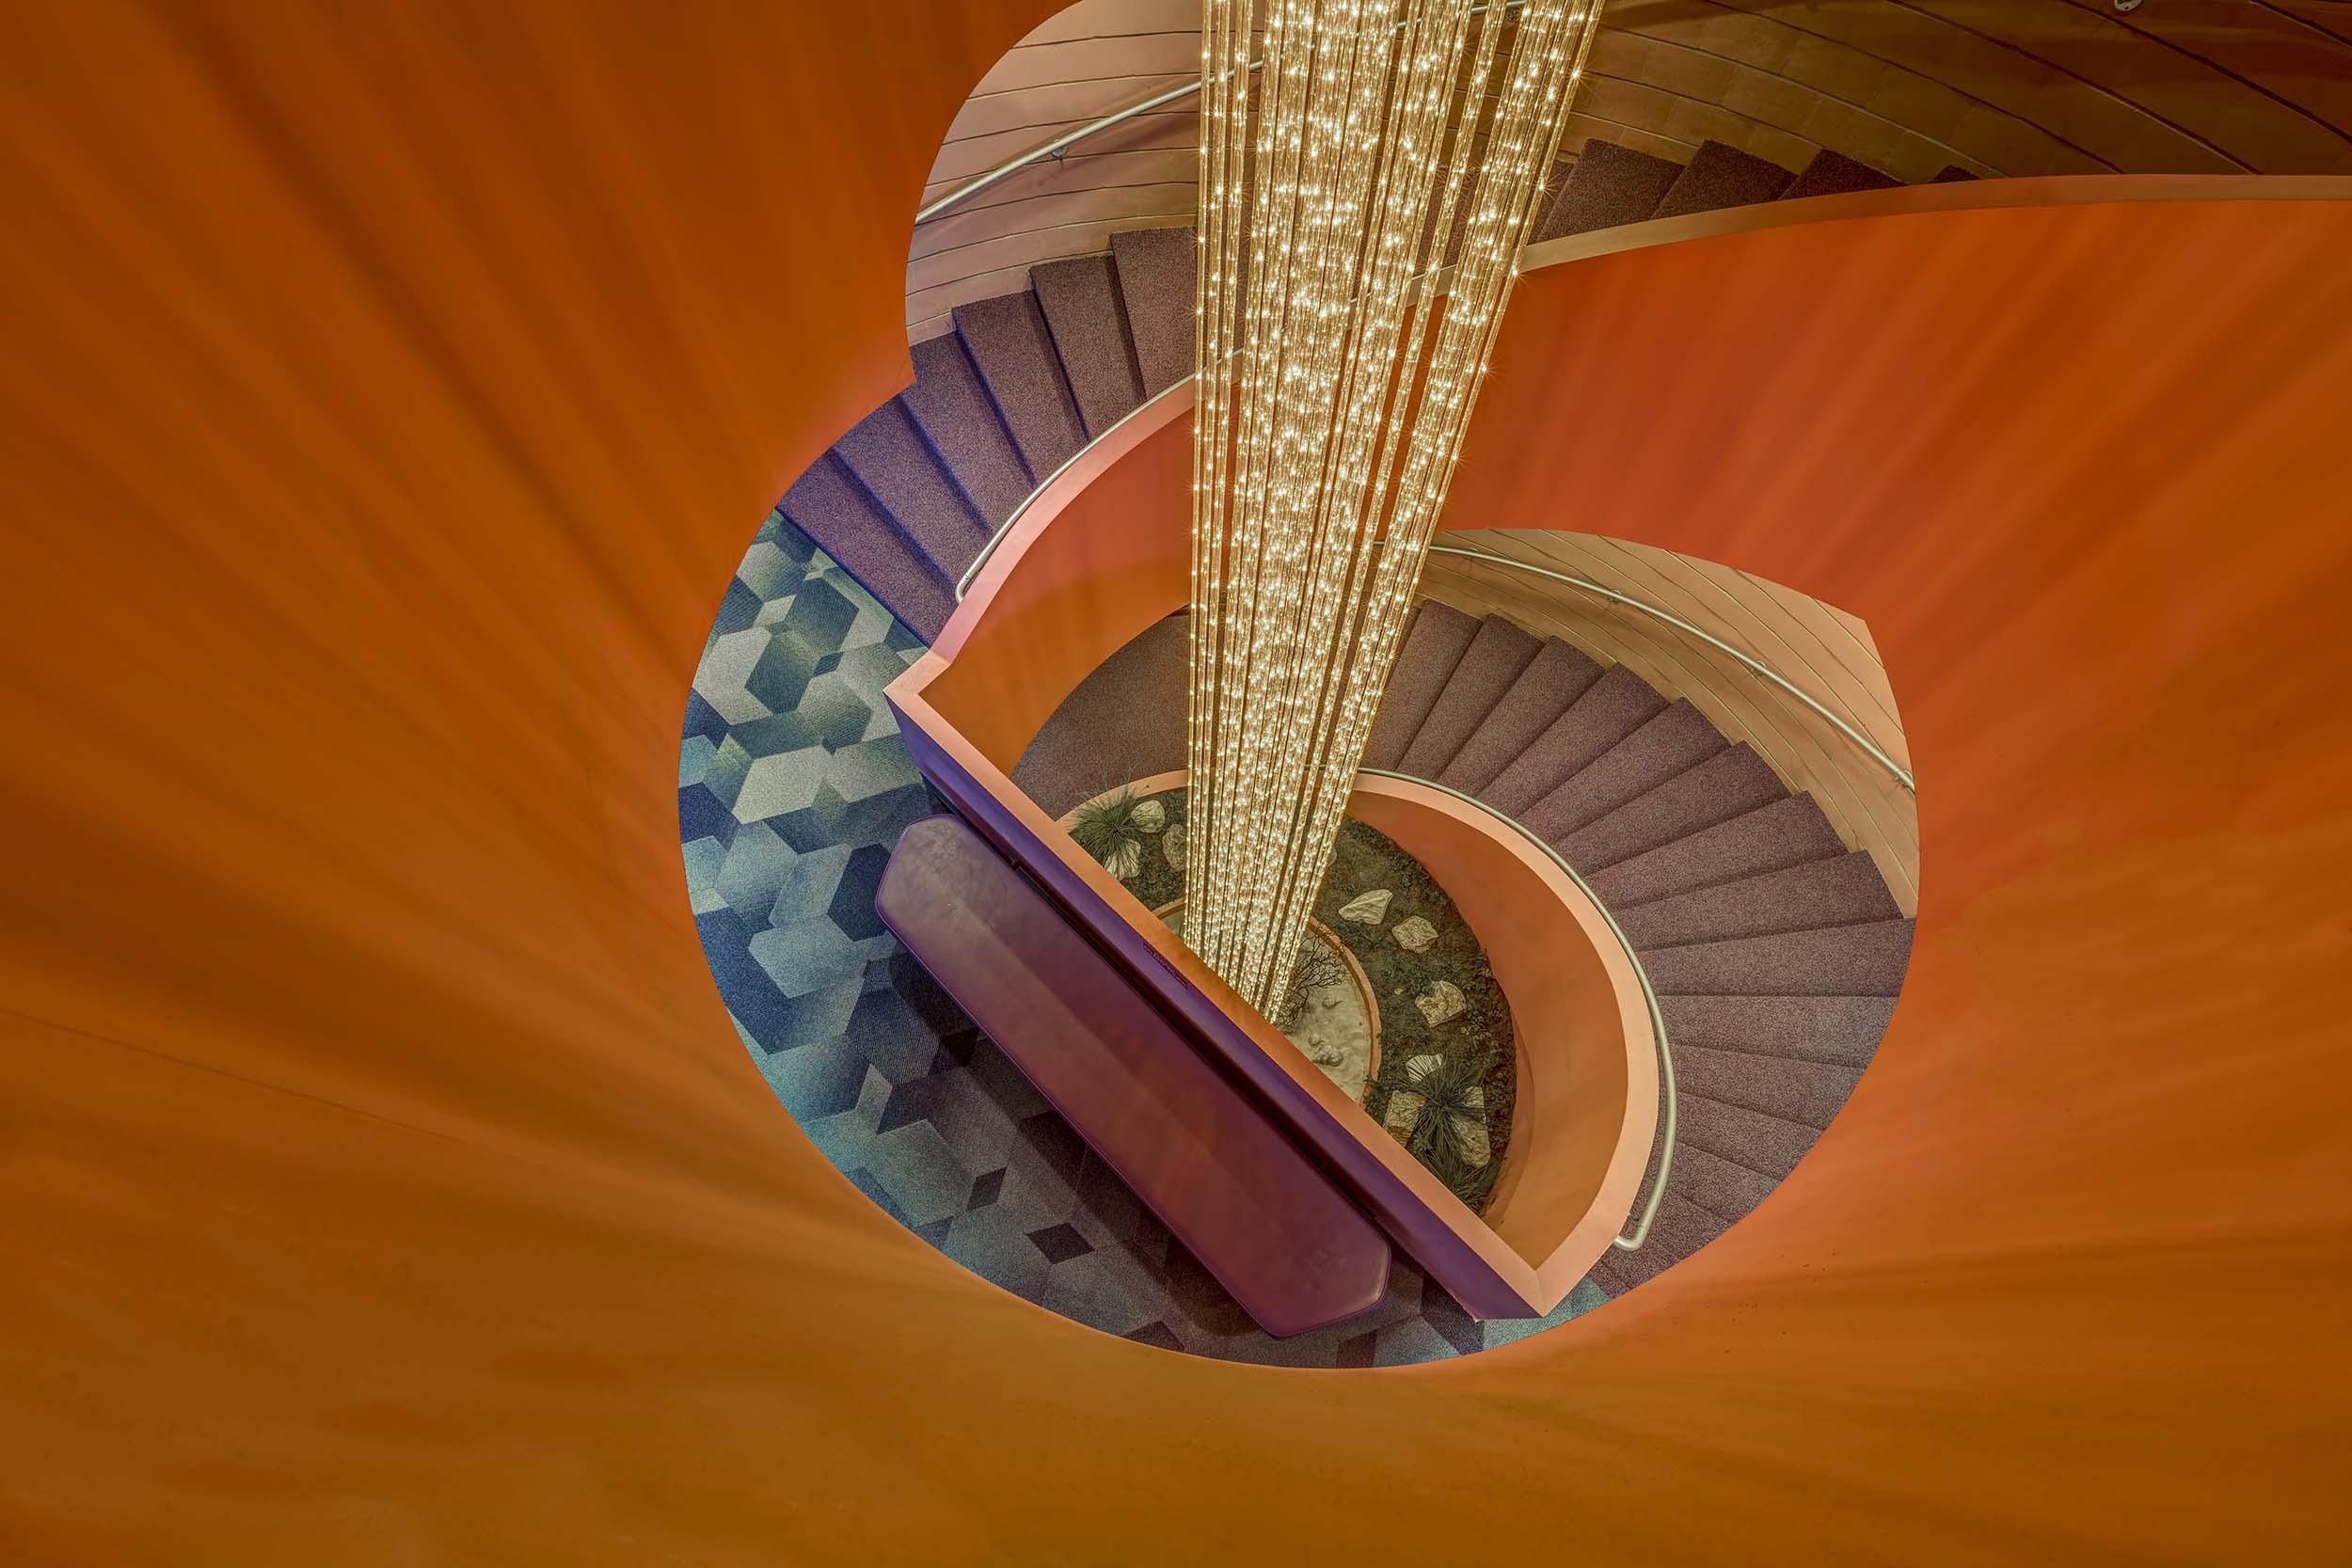 Solstice_Architects_Van_Wezel_06.jpg